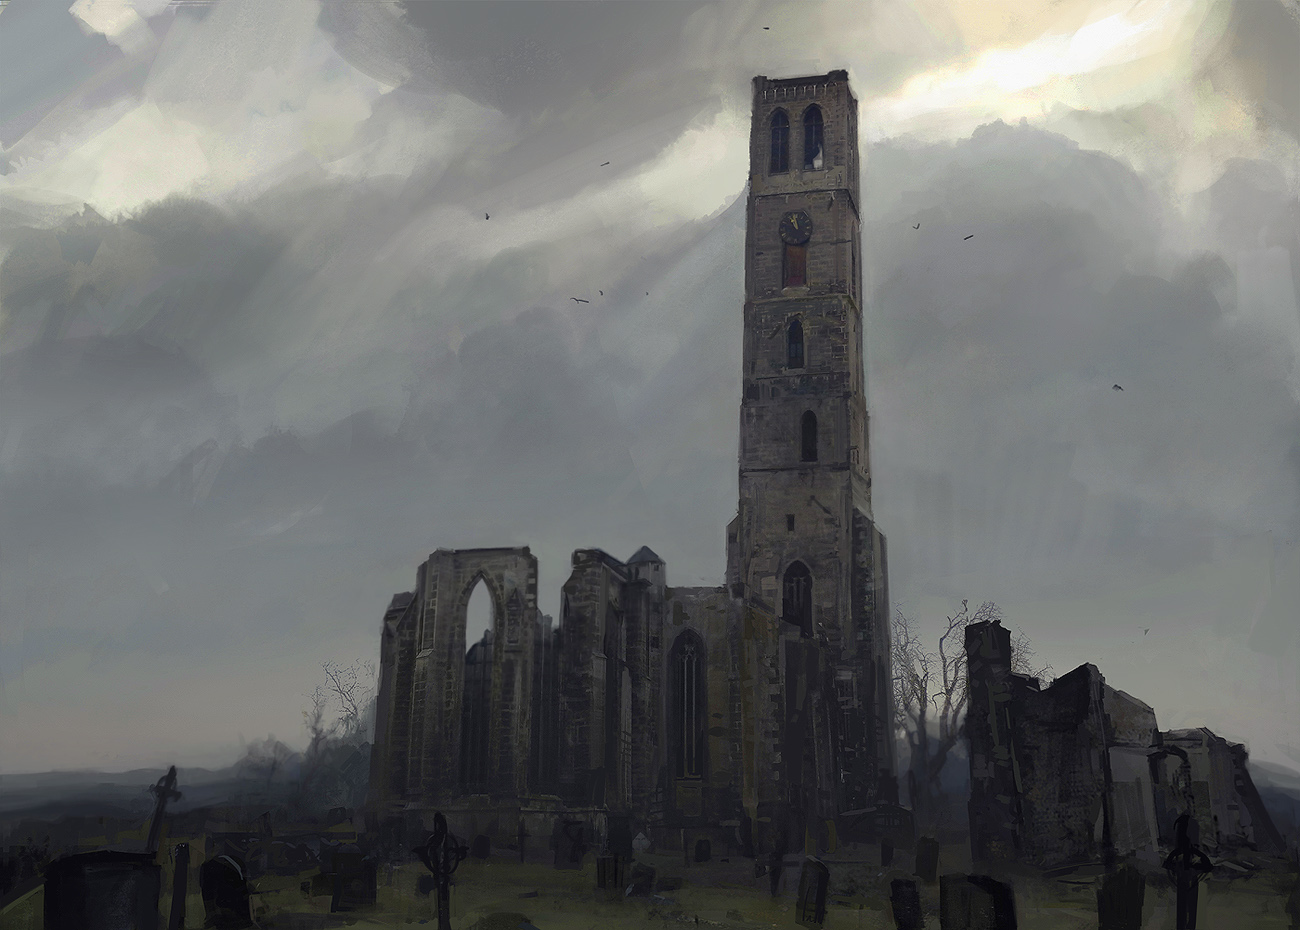 Desolated church